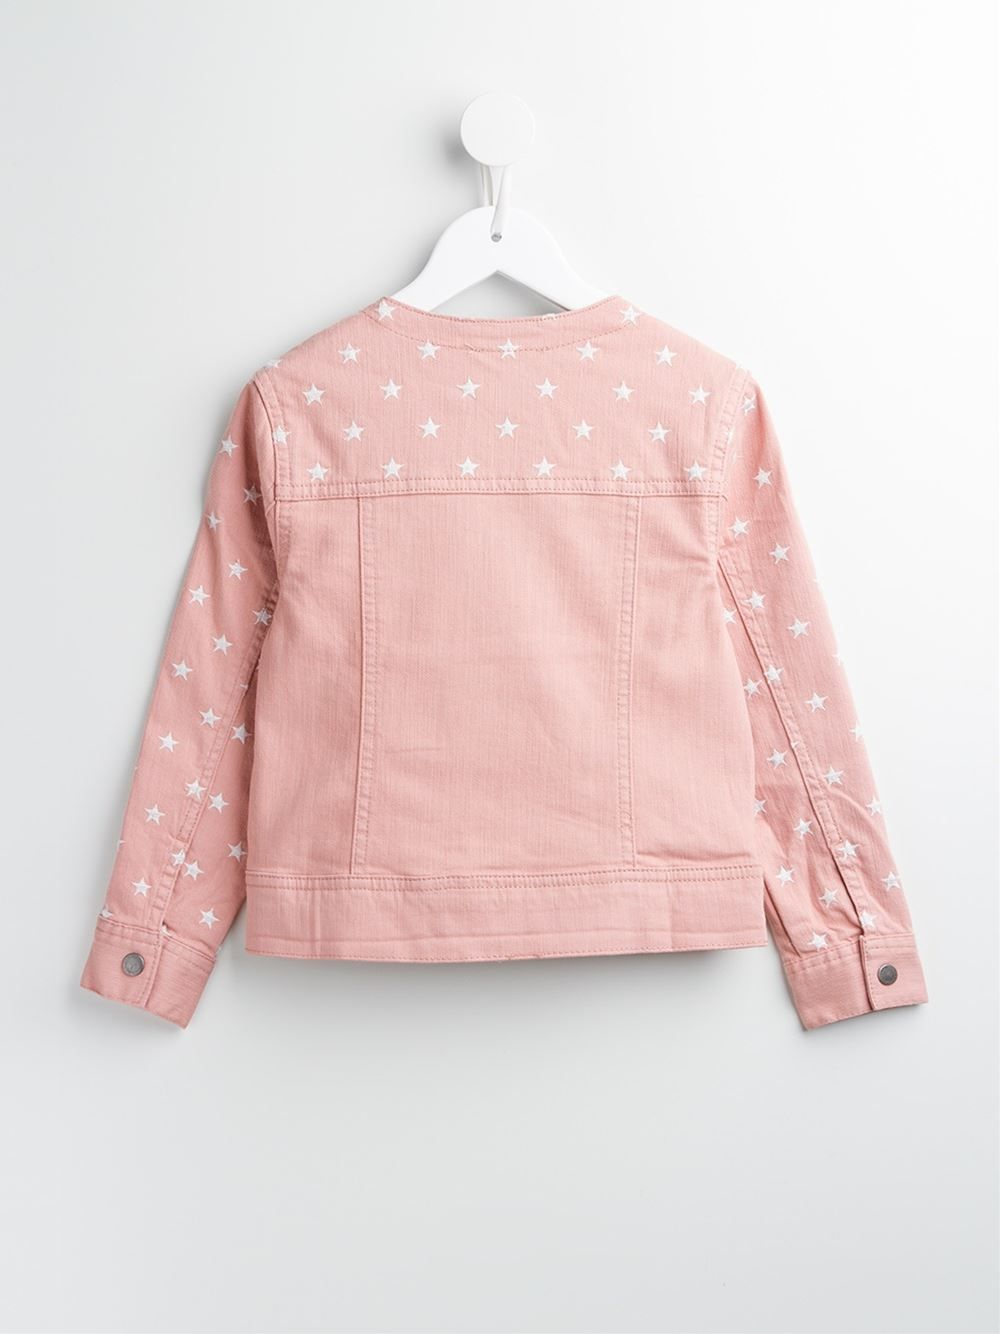 Stella Mccartney Kids Jaqueta jeans com fechamento oculto